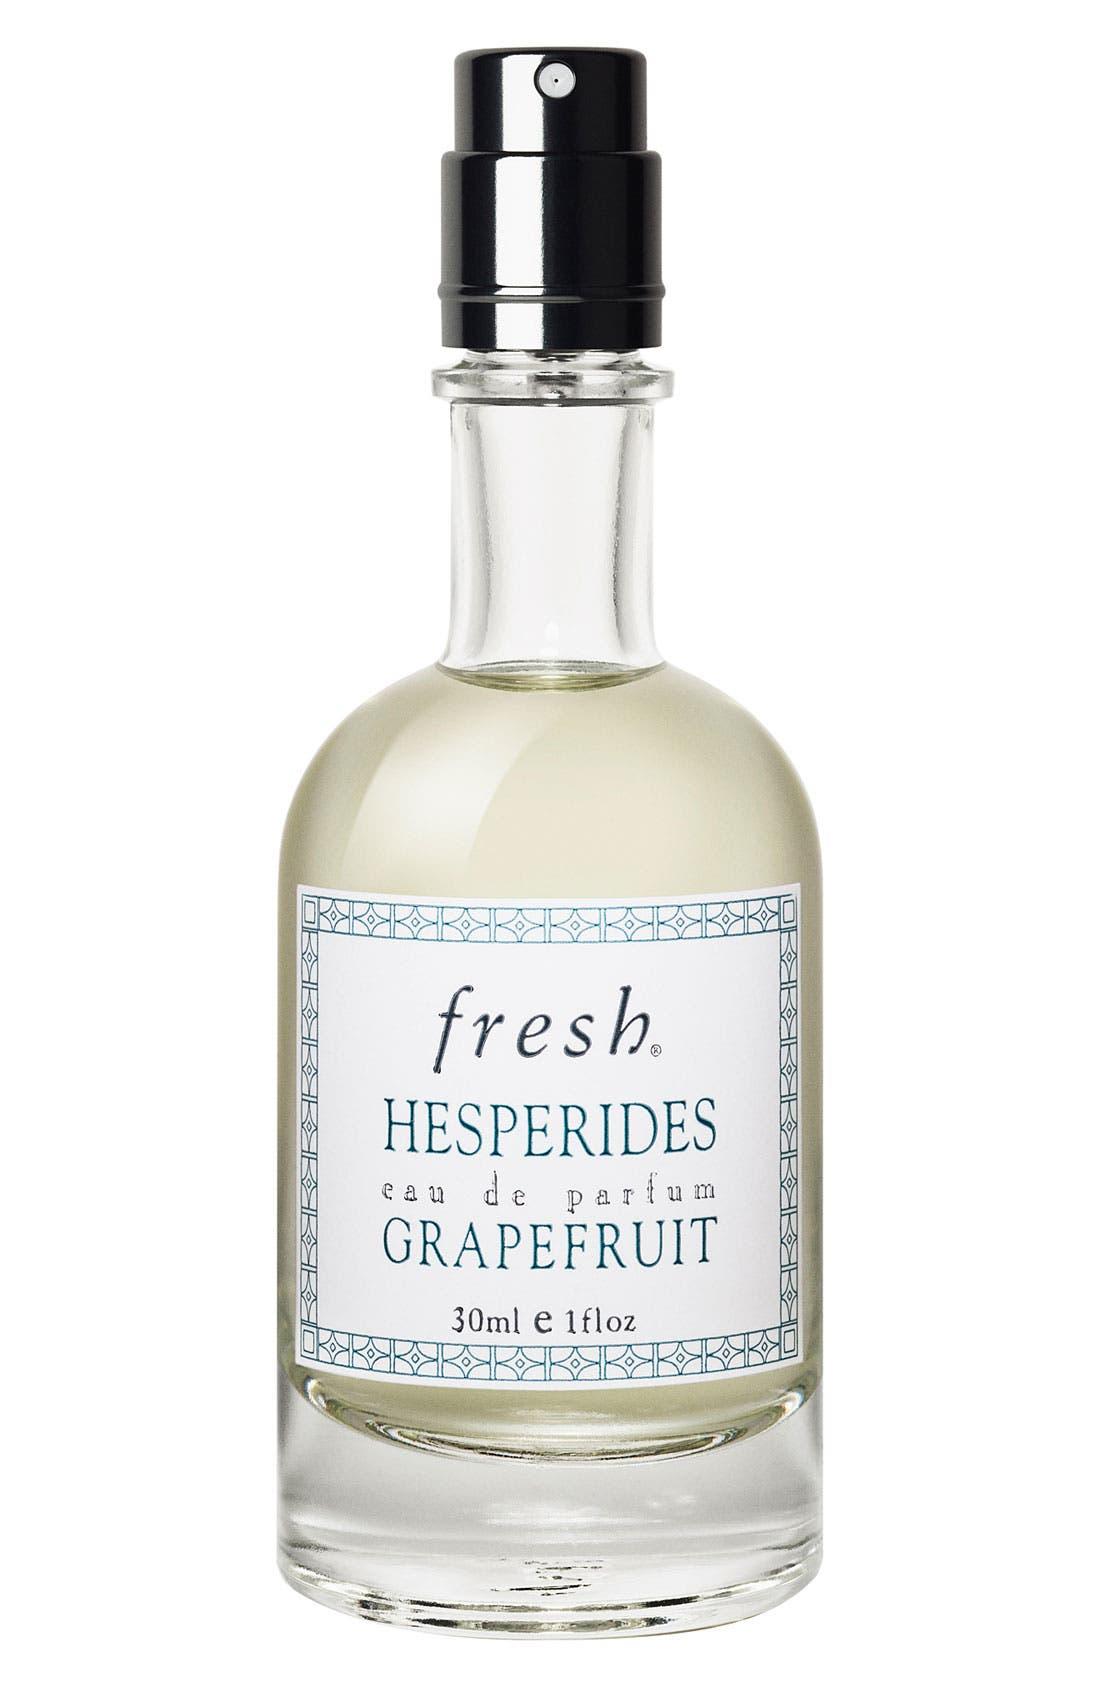 Fresh® 'Hesperides Grapefruit' Eau de Parfum